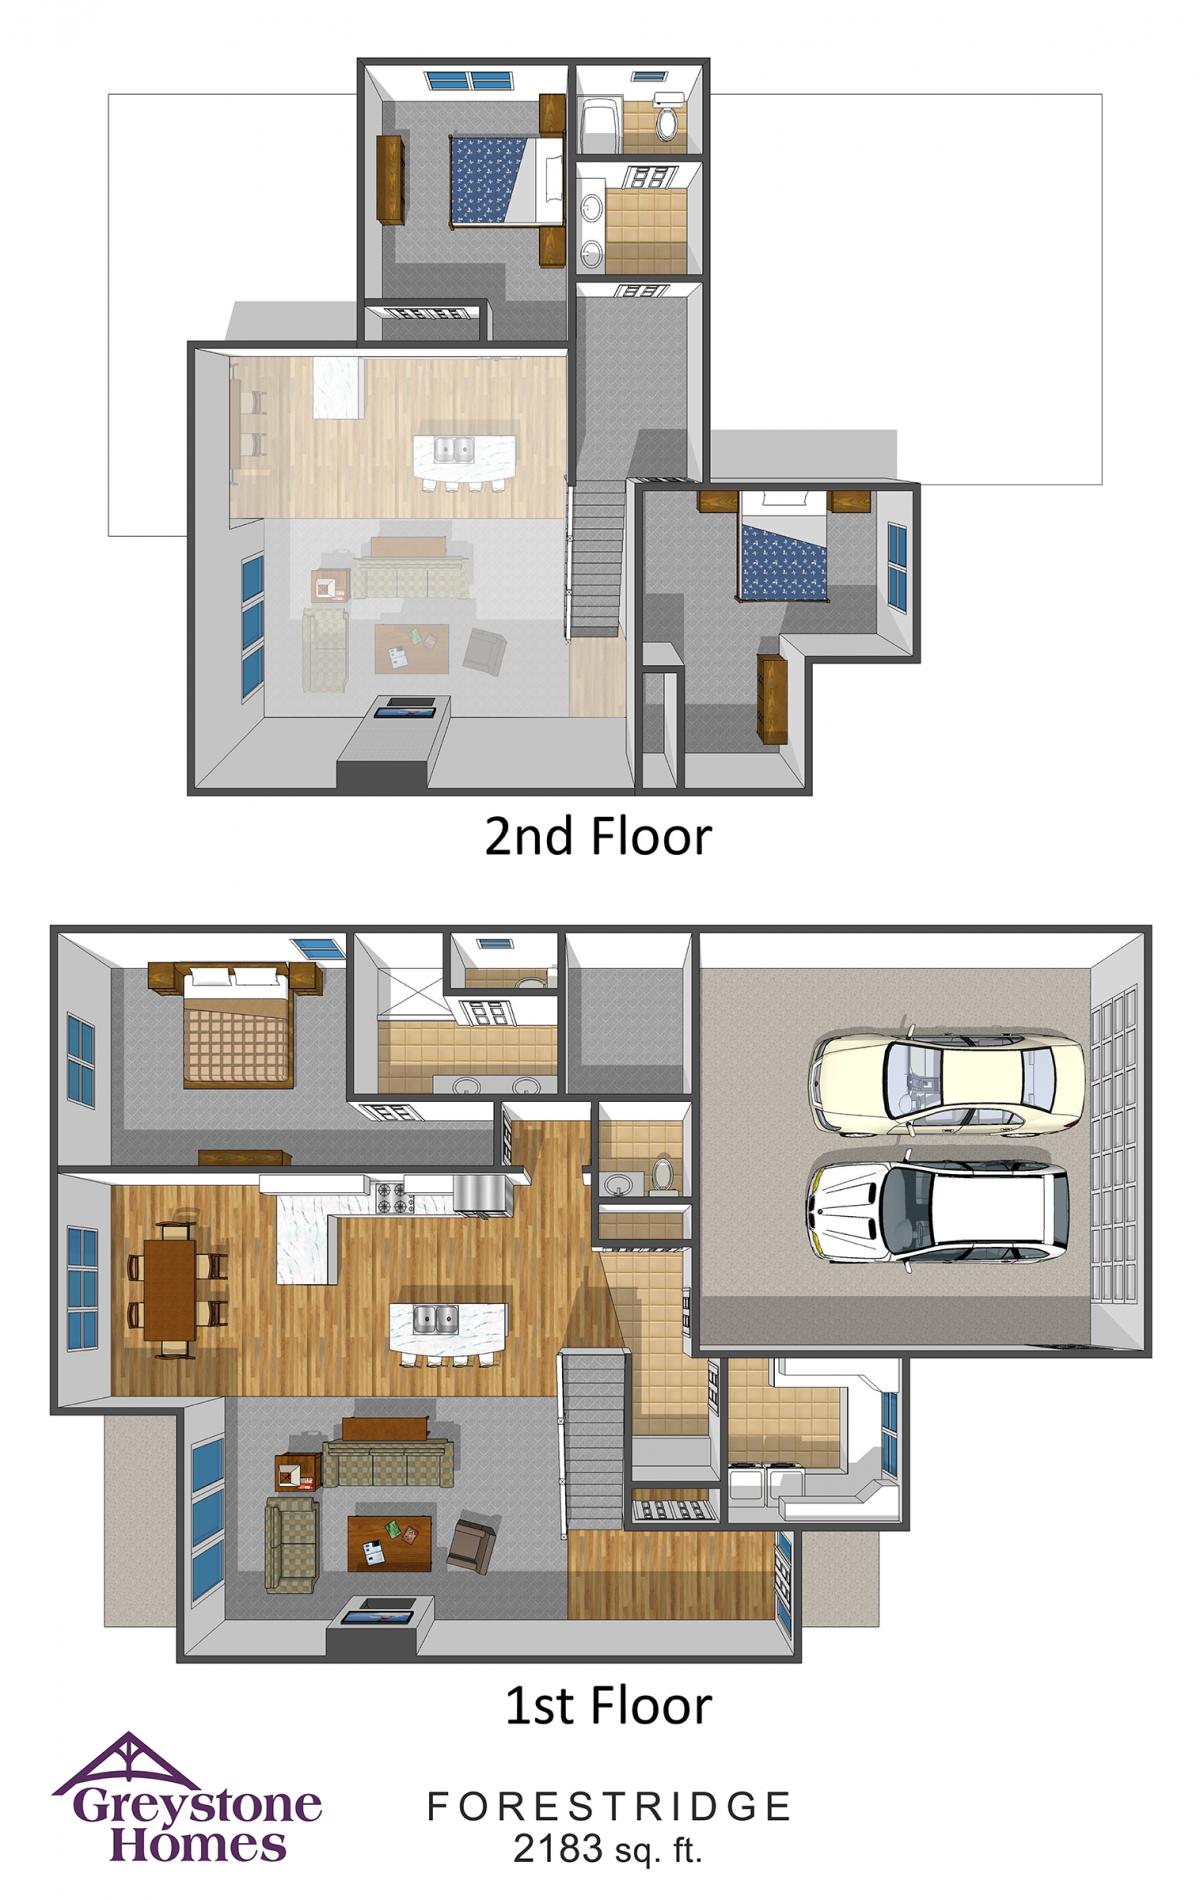 Forest Ridge Luxury Twin Homes floorplans